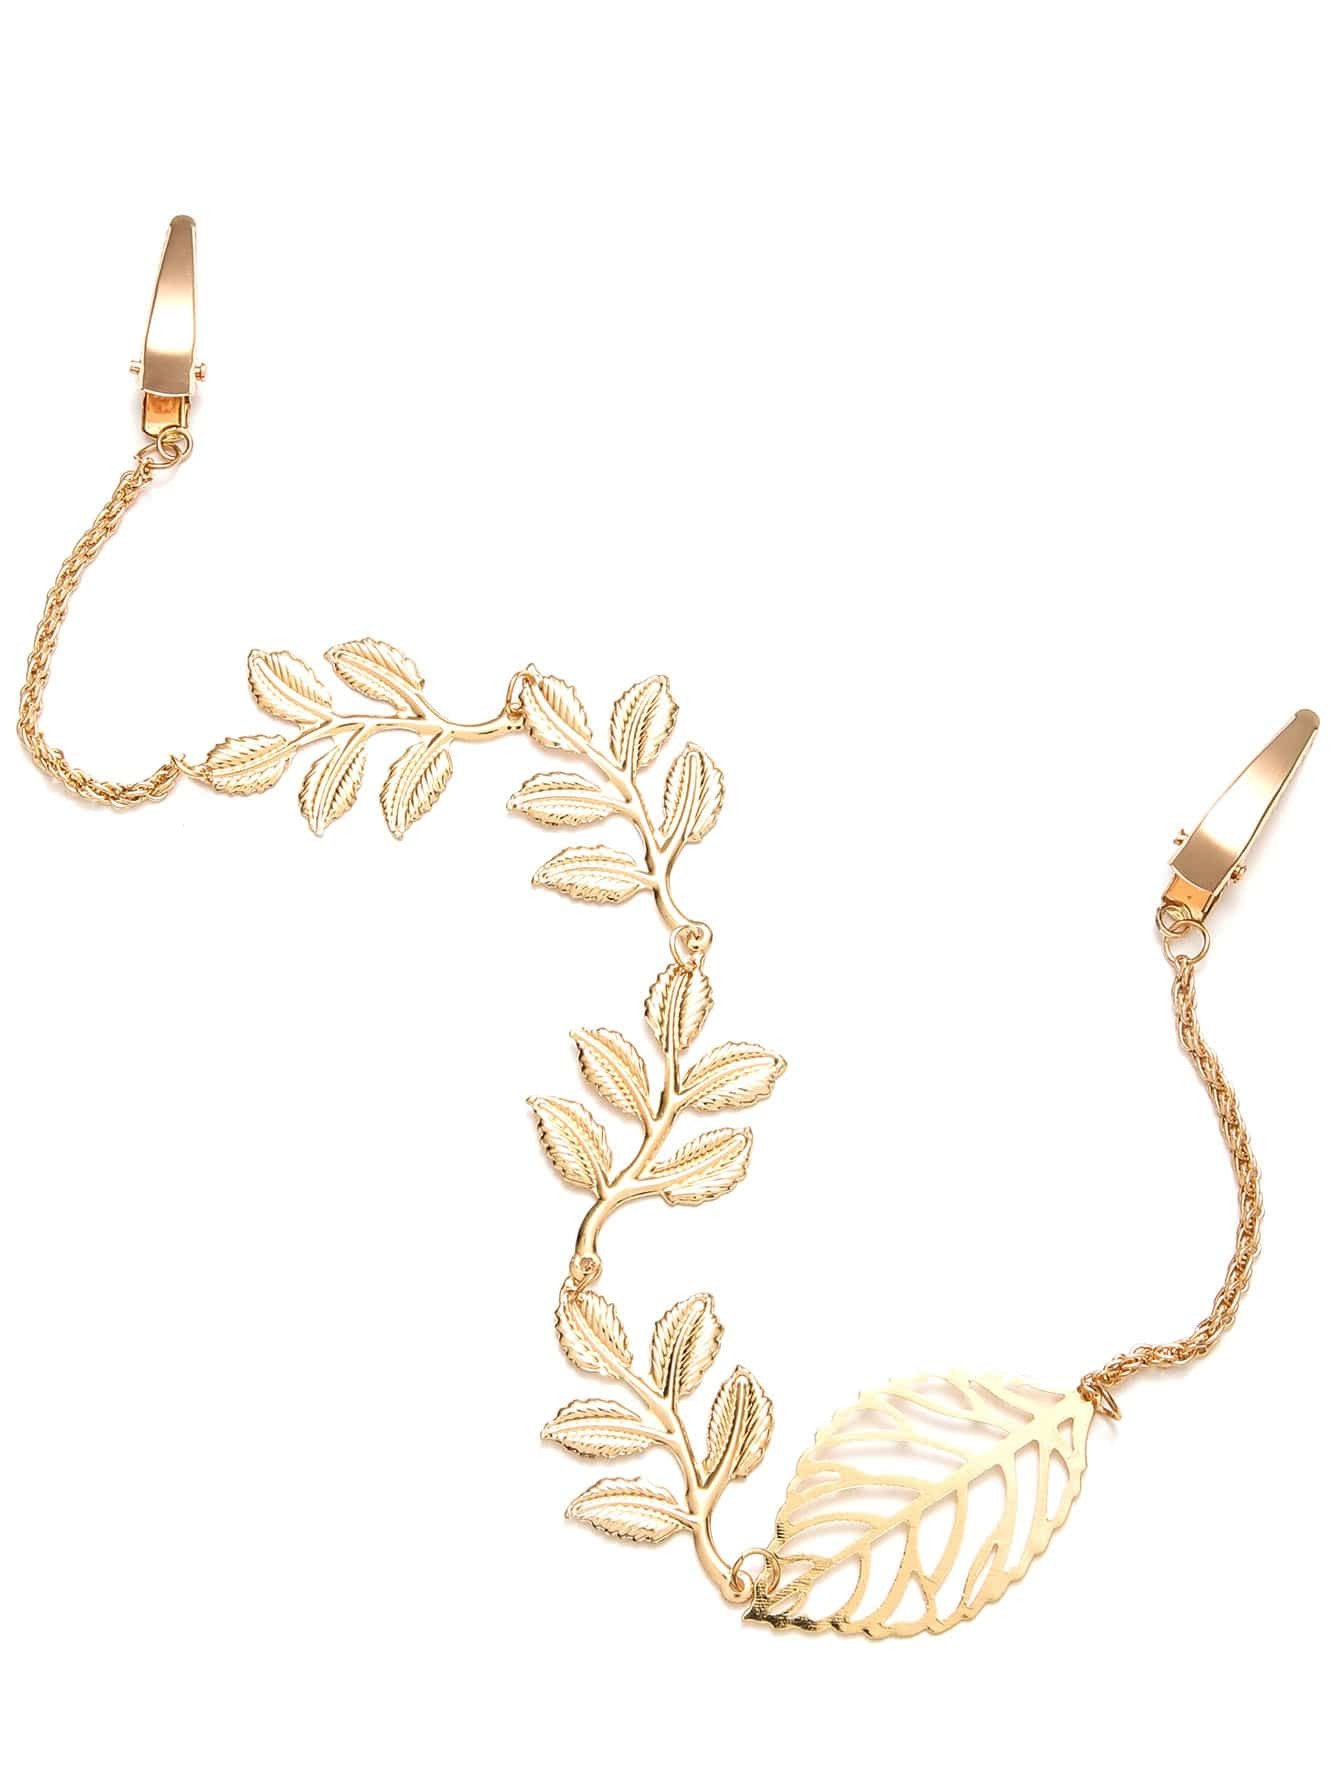 Фото Gold Plated Leaf Chain Hair Accessory. Купить с доставкой